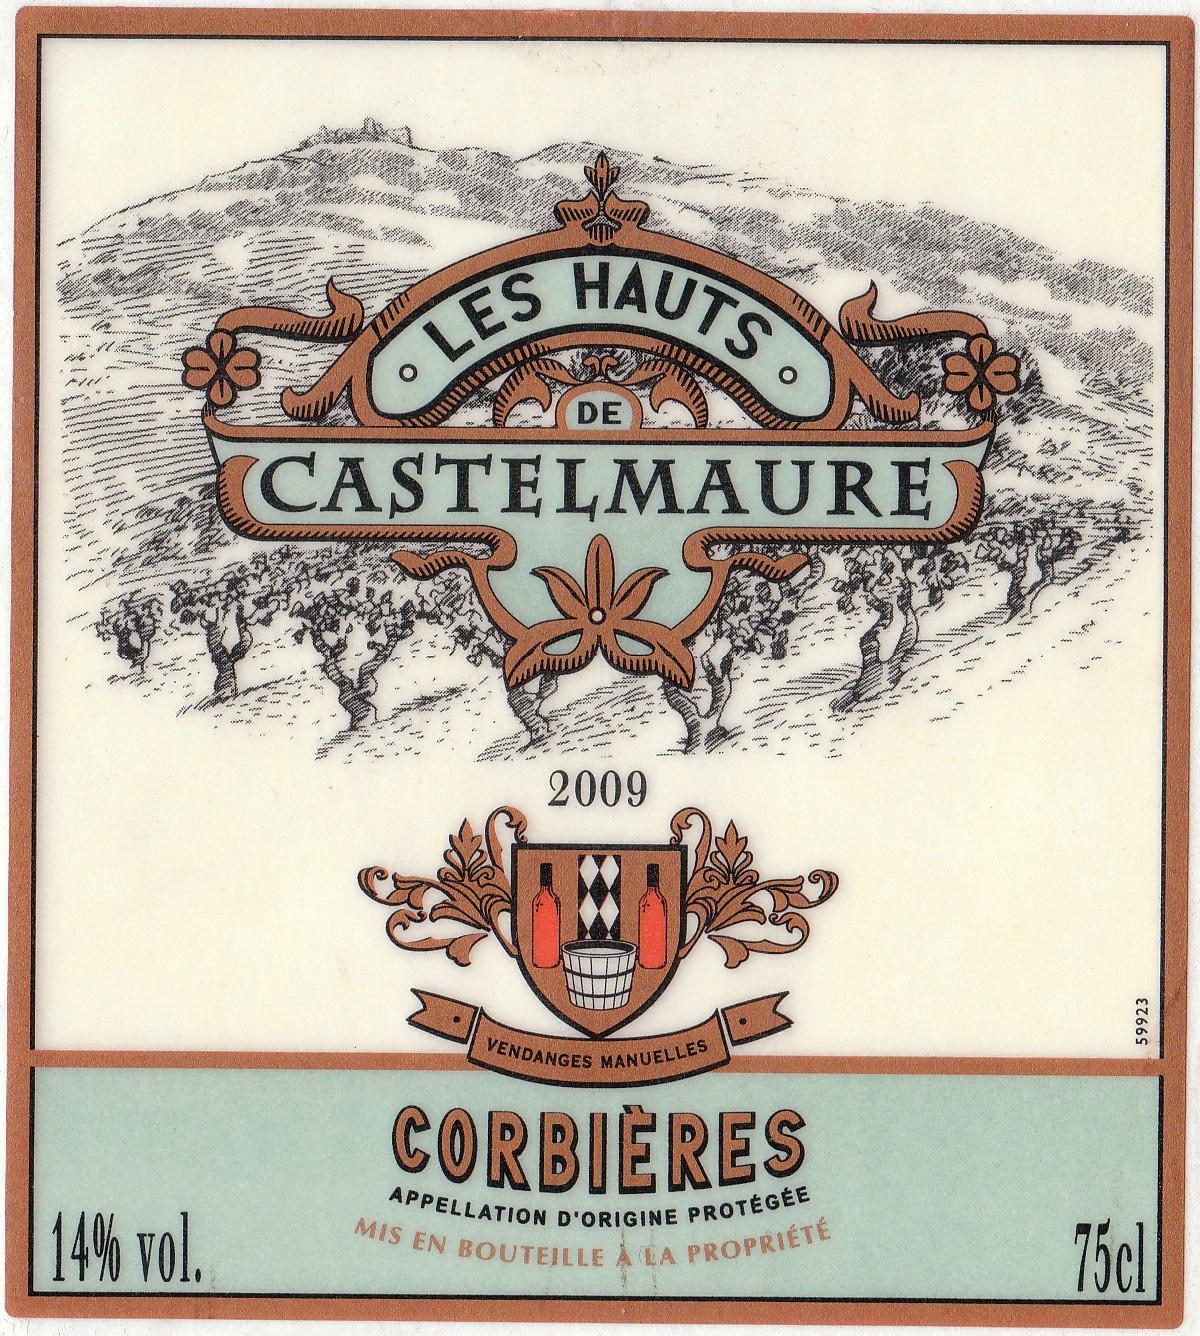 Hauts d Castelmaure